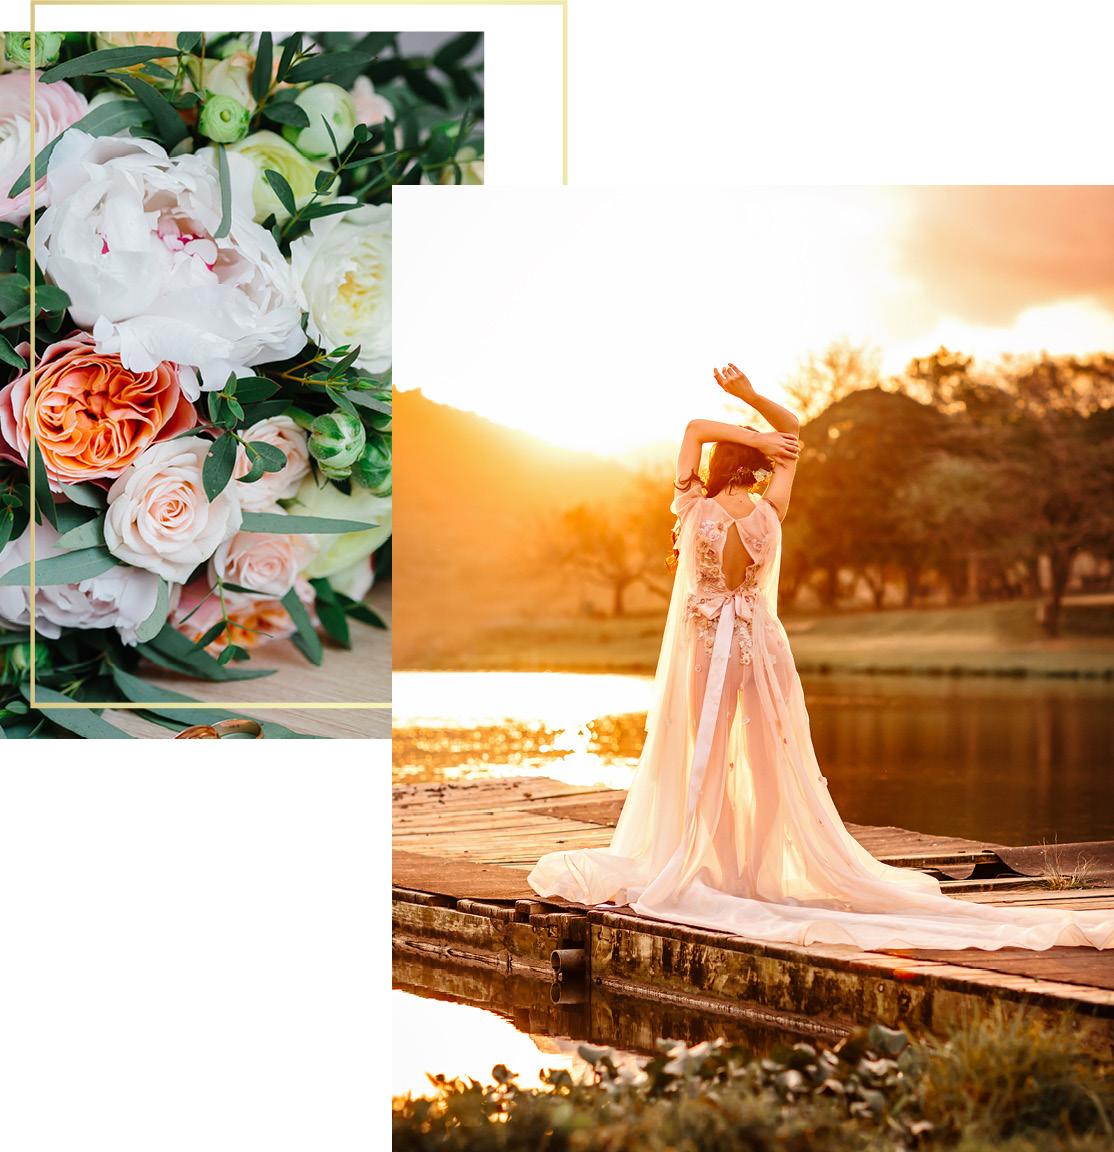 Lauren Setterberg Photography